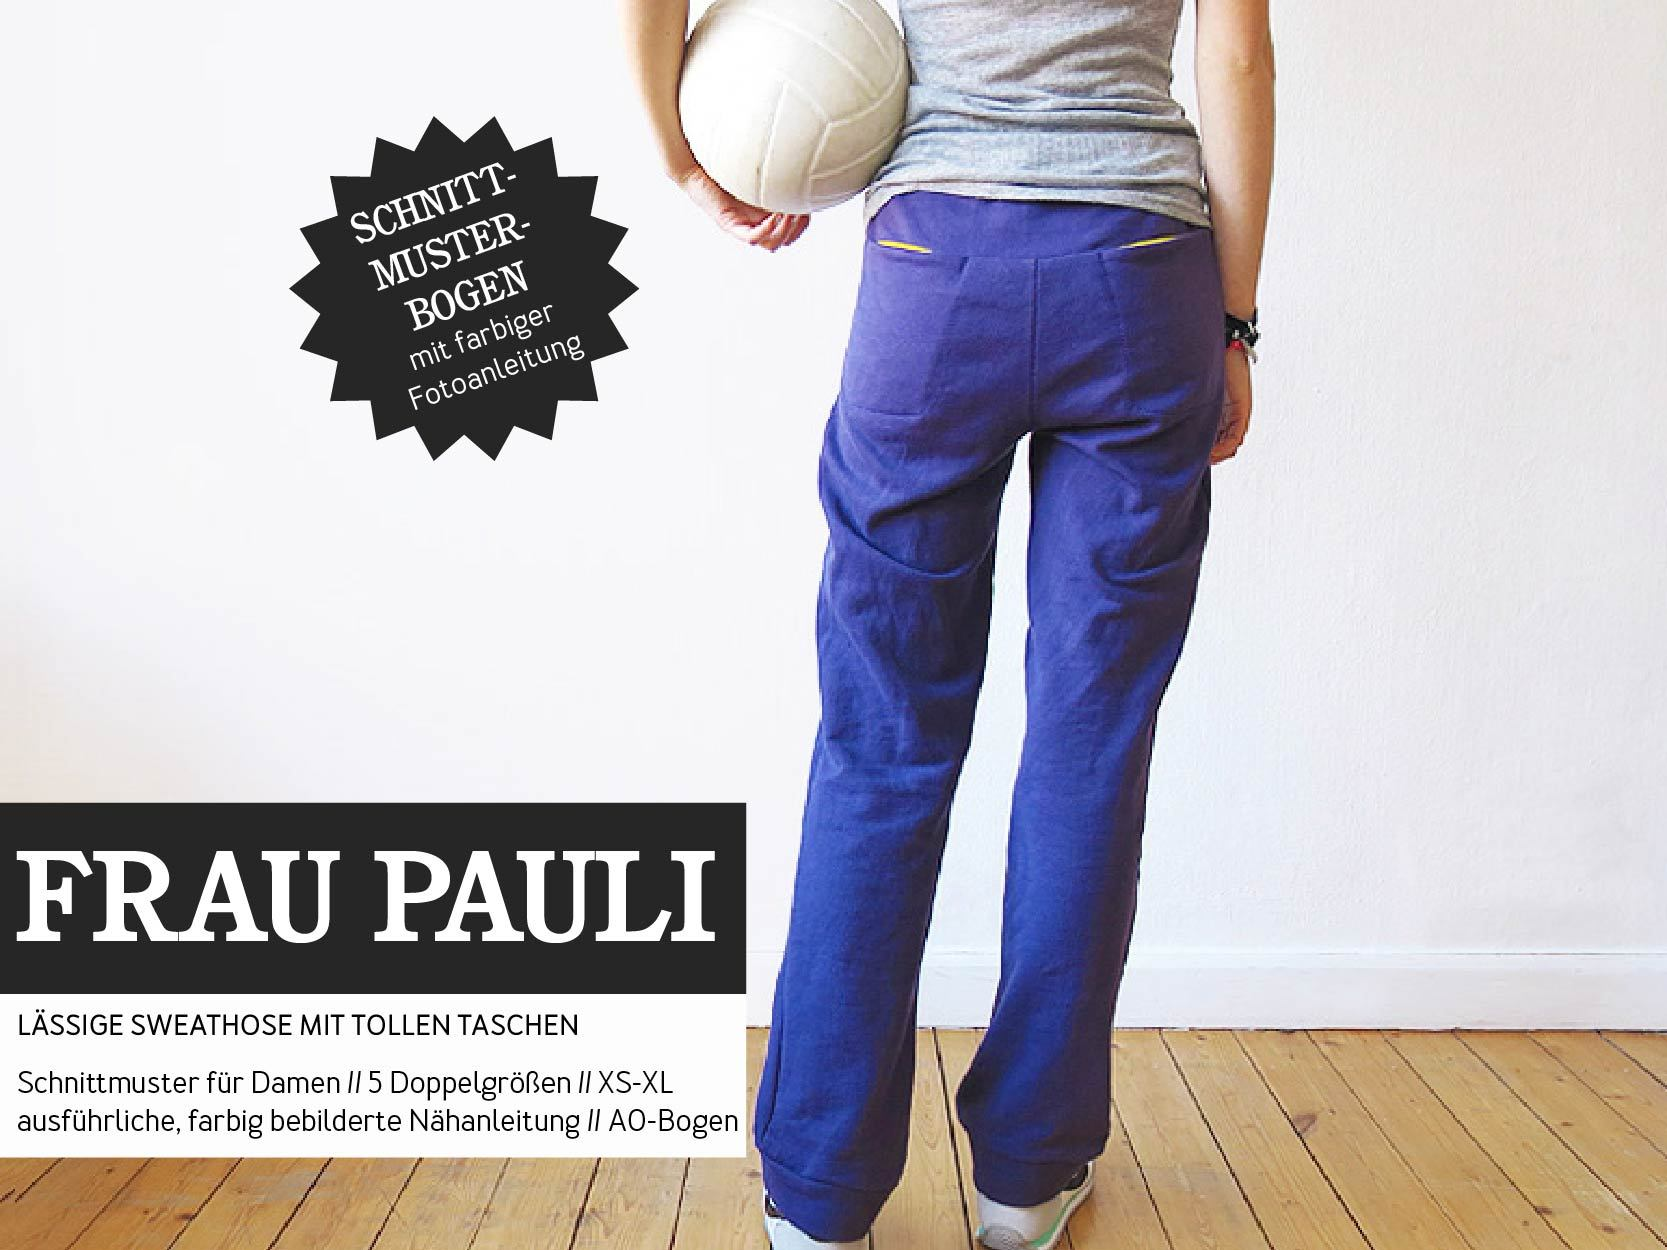 STUDIO SCHNITTREIF Frau Pauli Jogging Hose Papierschnittmuster